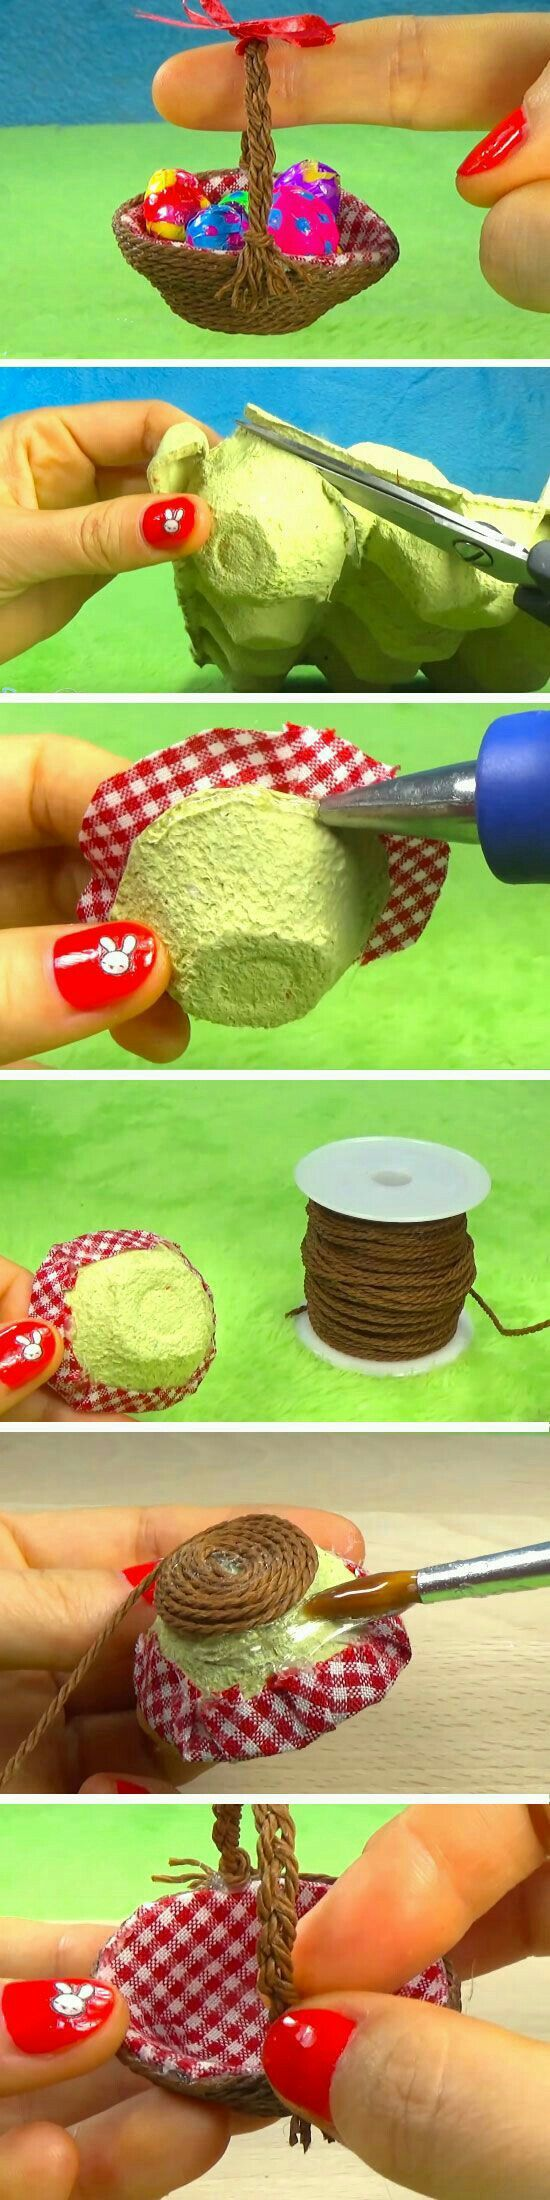 Miniature basket made from an egg carton El işi http://turkrazzi.com/ppost/384424518181596382/ El işi http://turkrazzi.com/ppost/619315386228934167/